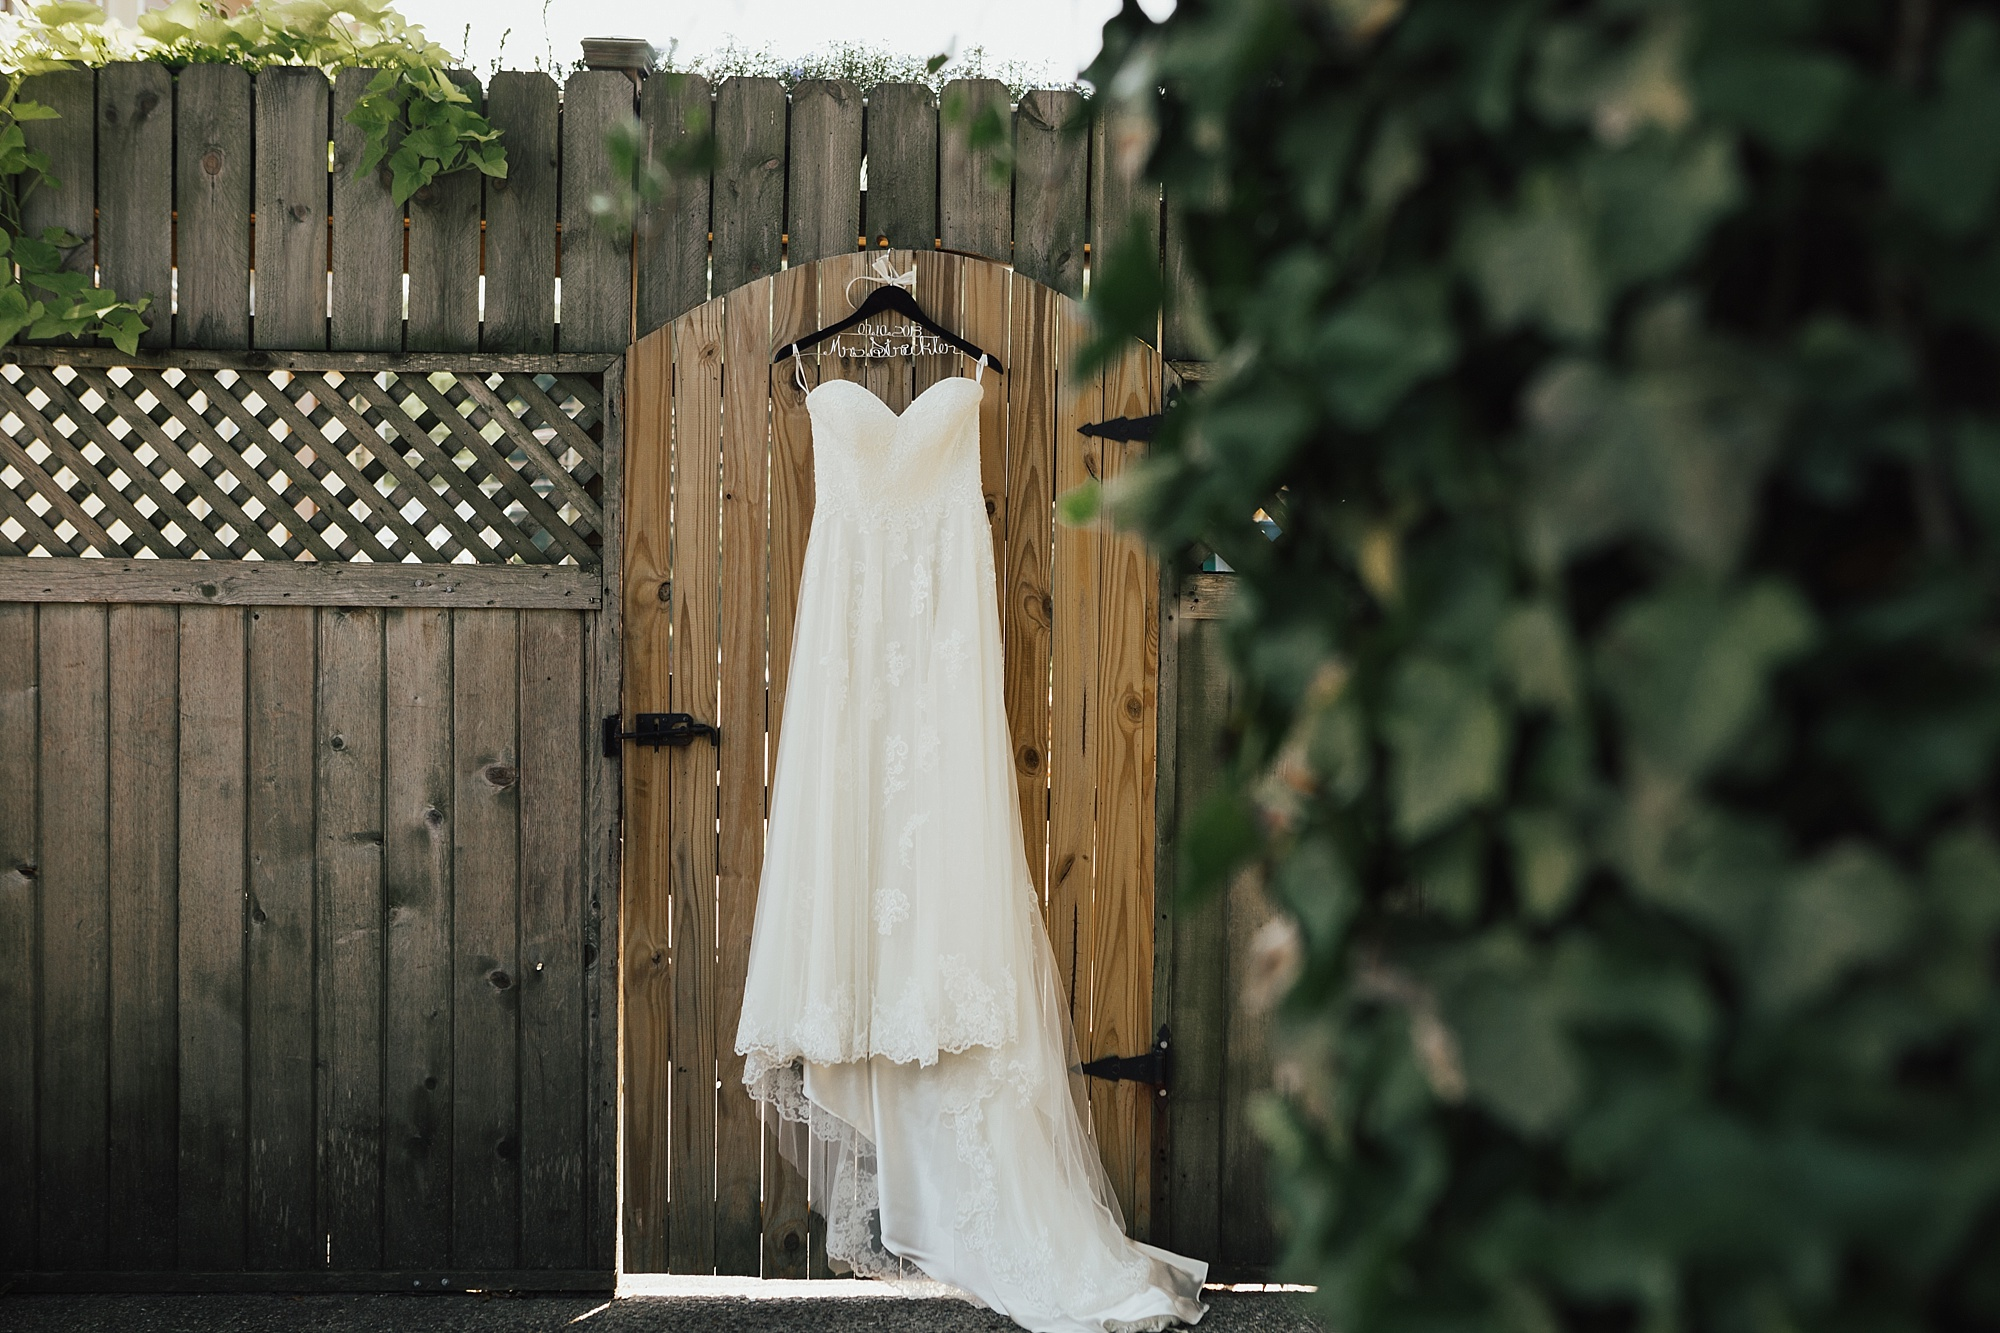 Love_by_Joe_Mac_Nicole_Patrick_Gables_At_Chadds_Ford_Wedding_Photography_Best_Philadelphia__0004.jpg